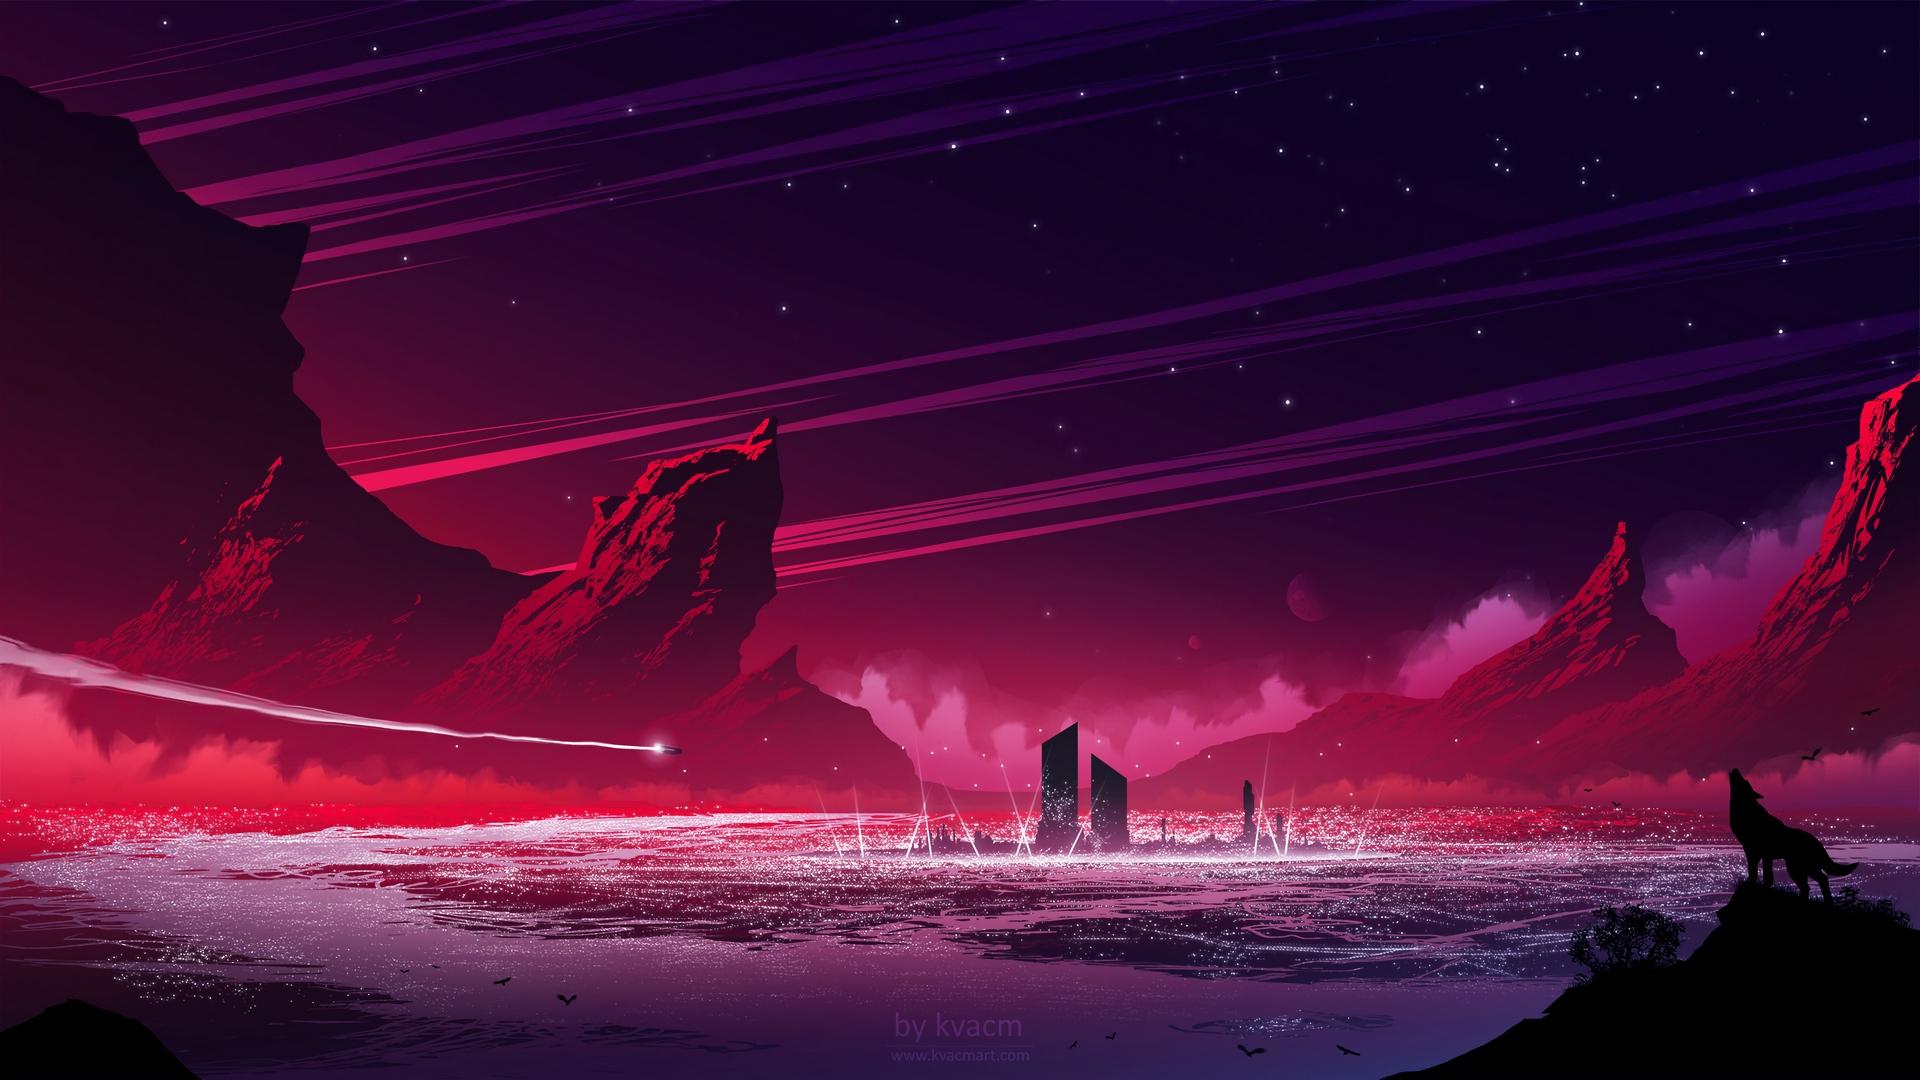 Art Background Art Background Hd Purple Super HD 6704 1920x1080